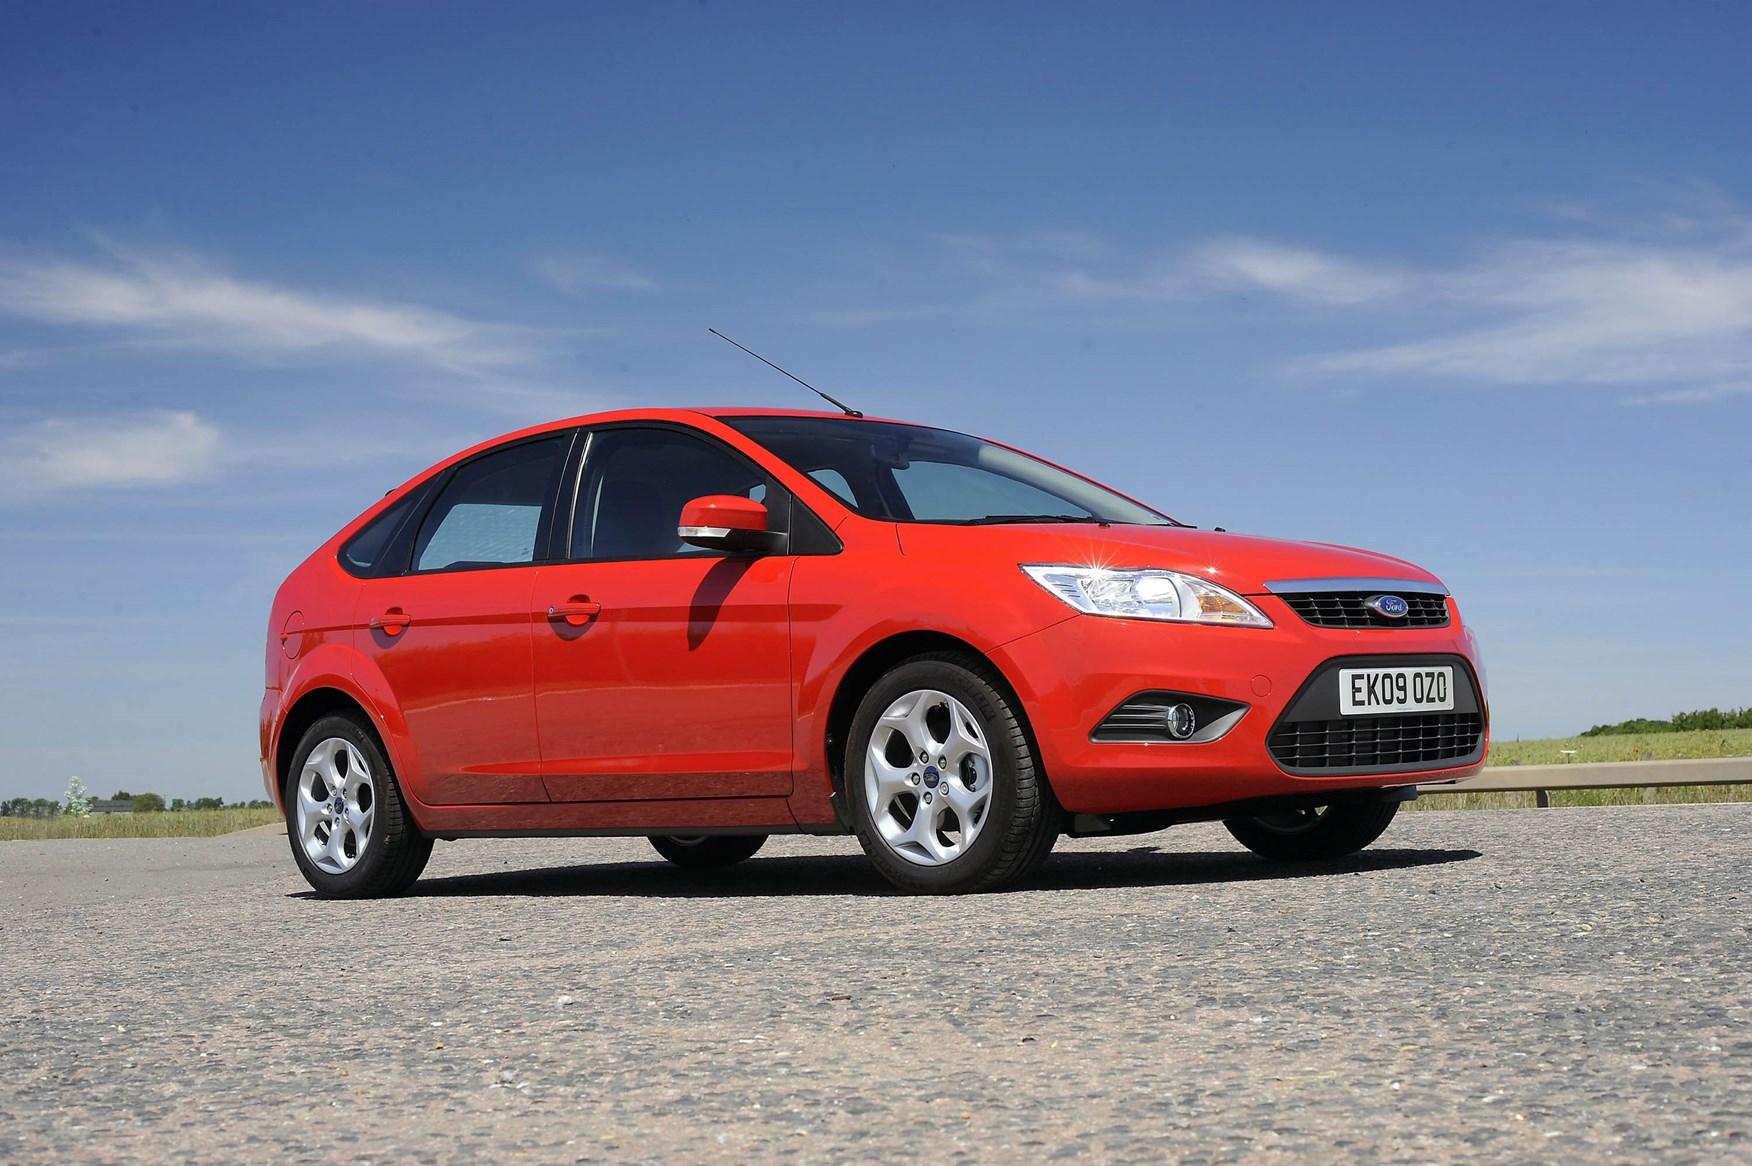 Ford Focus Hatchback Review 2005 2011 Parkers 2007 Se Engine Size